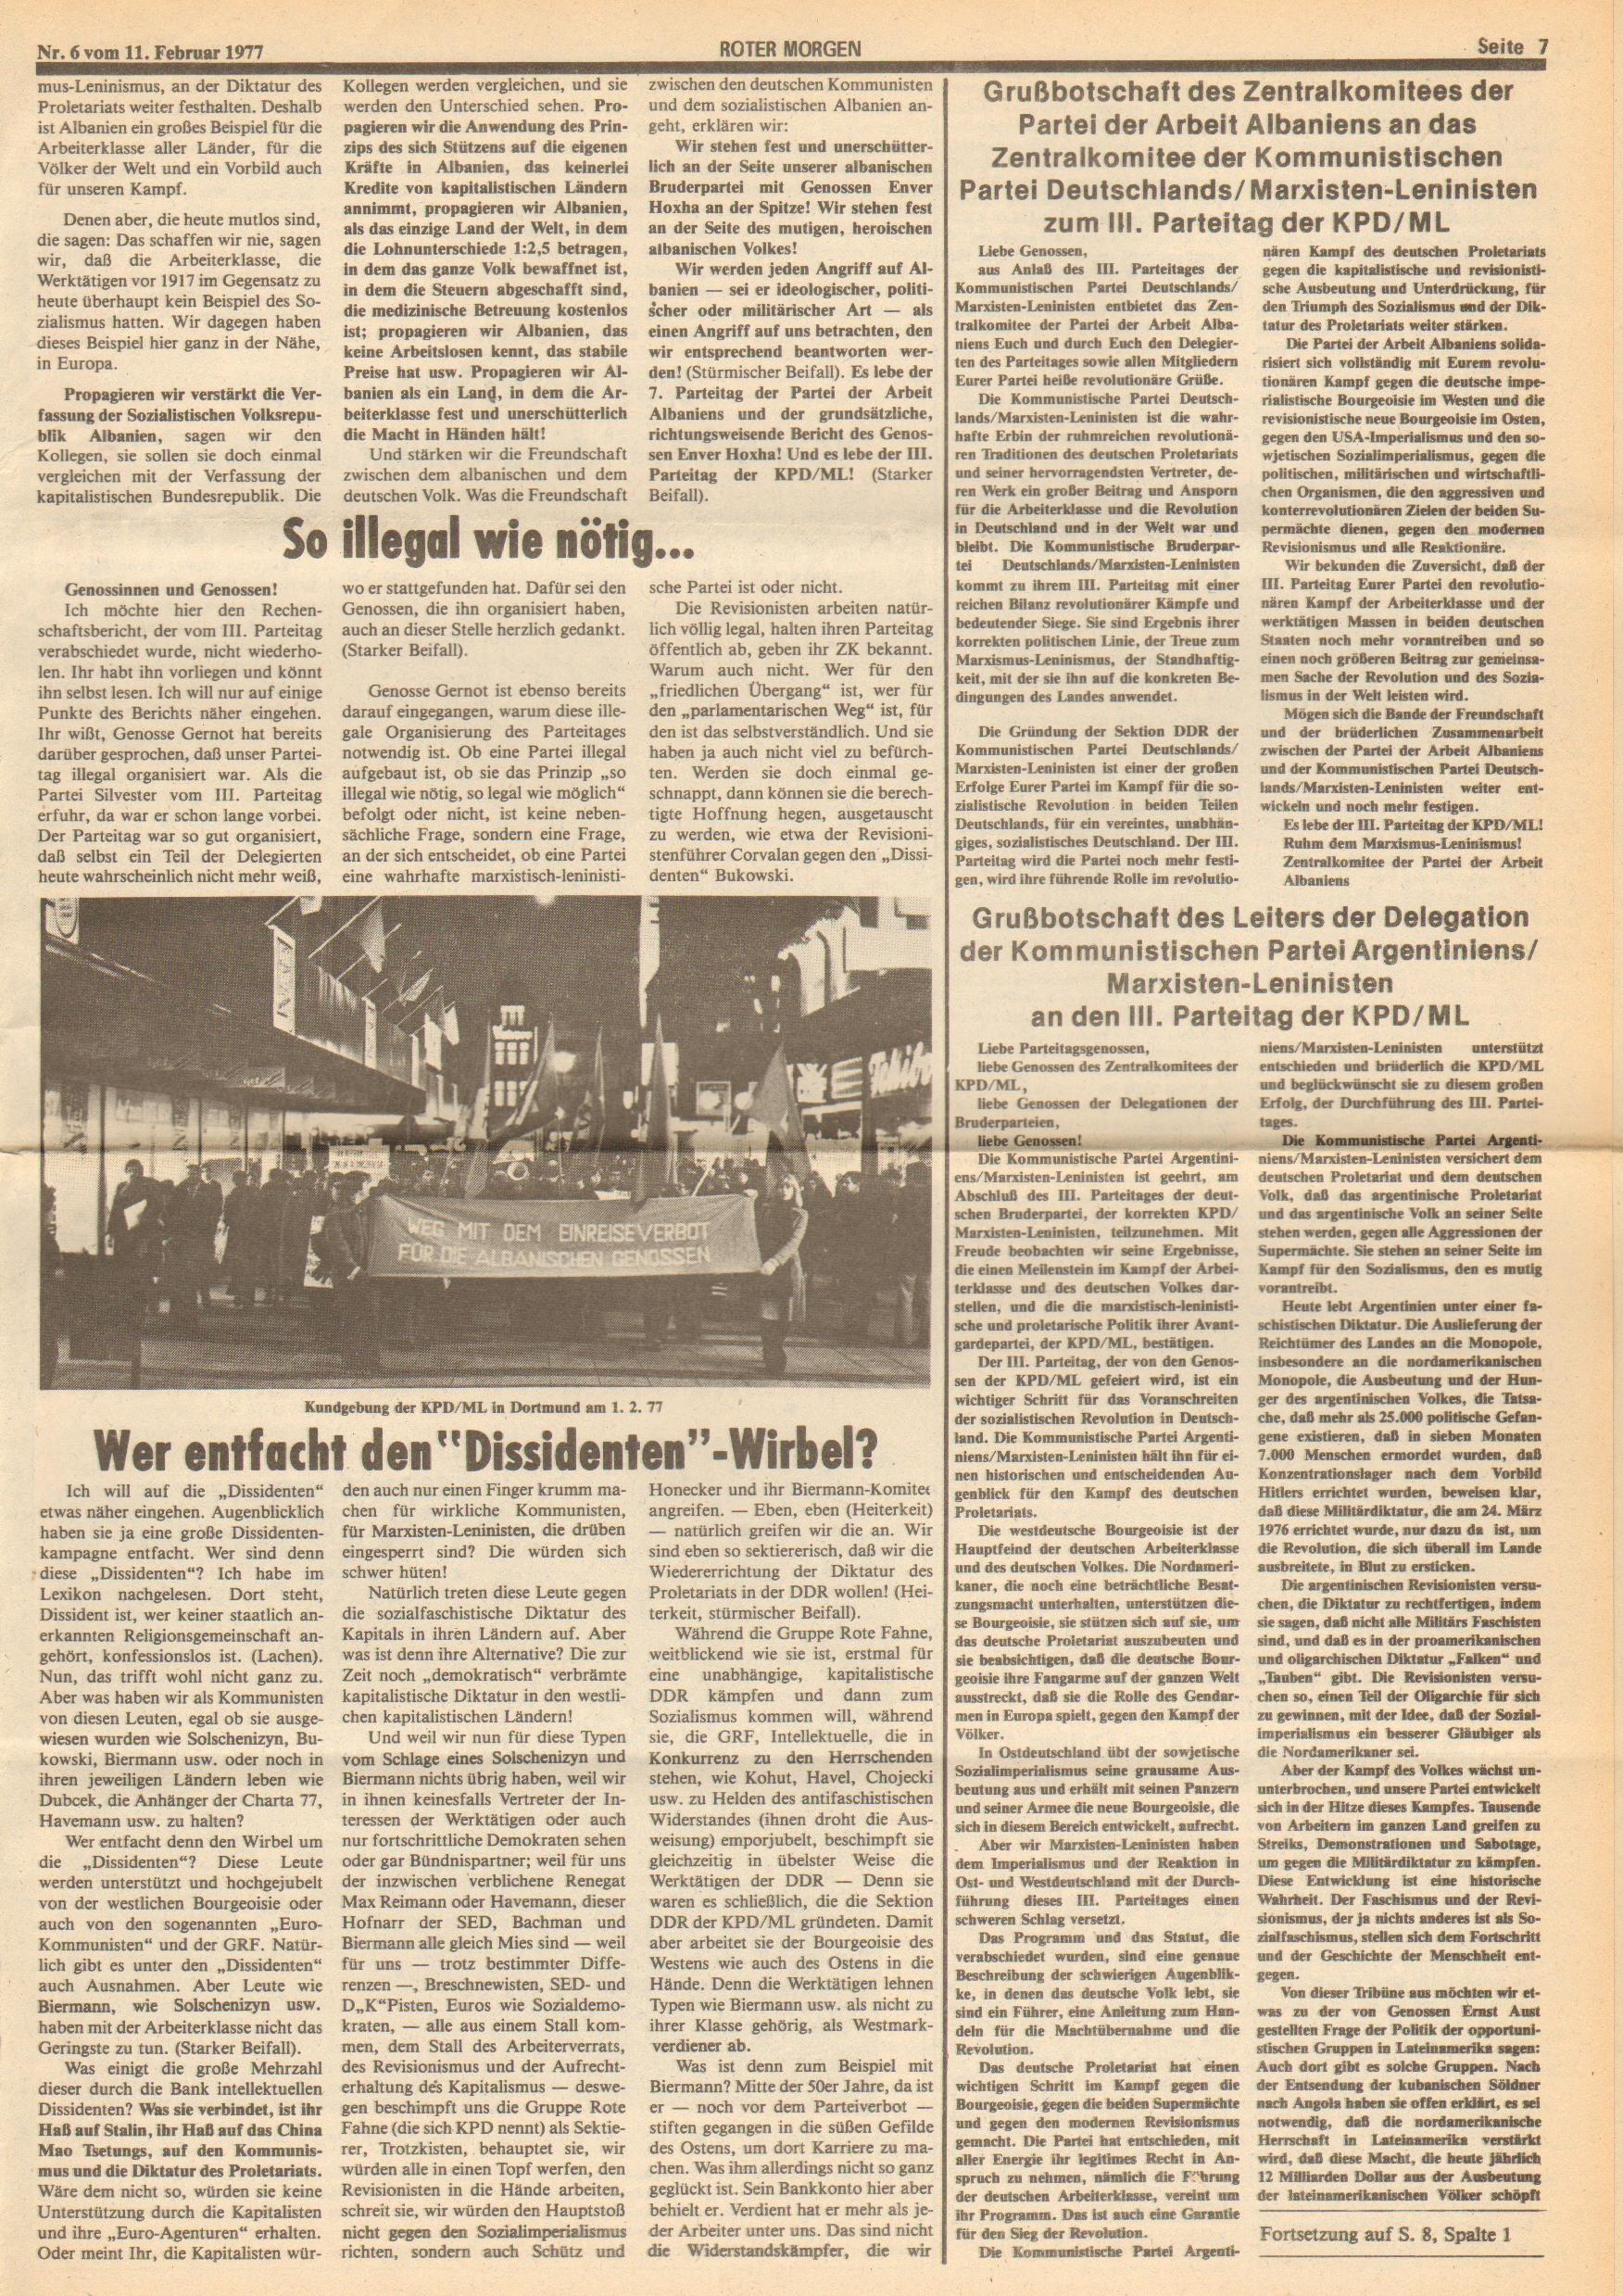 Roter Morgen, 11. Jg., 11. Februar 1977, Nr. 6, Seite 7